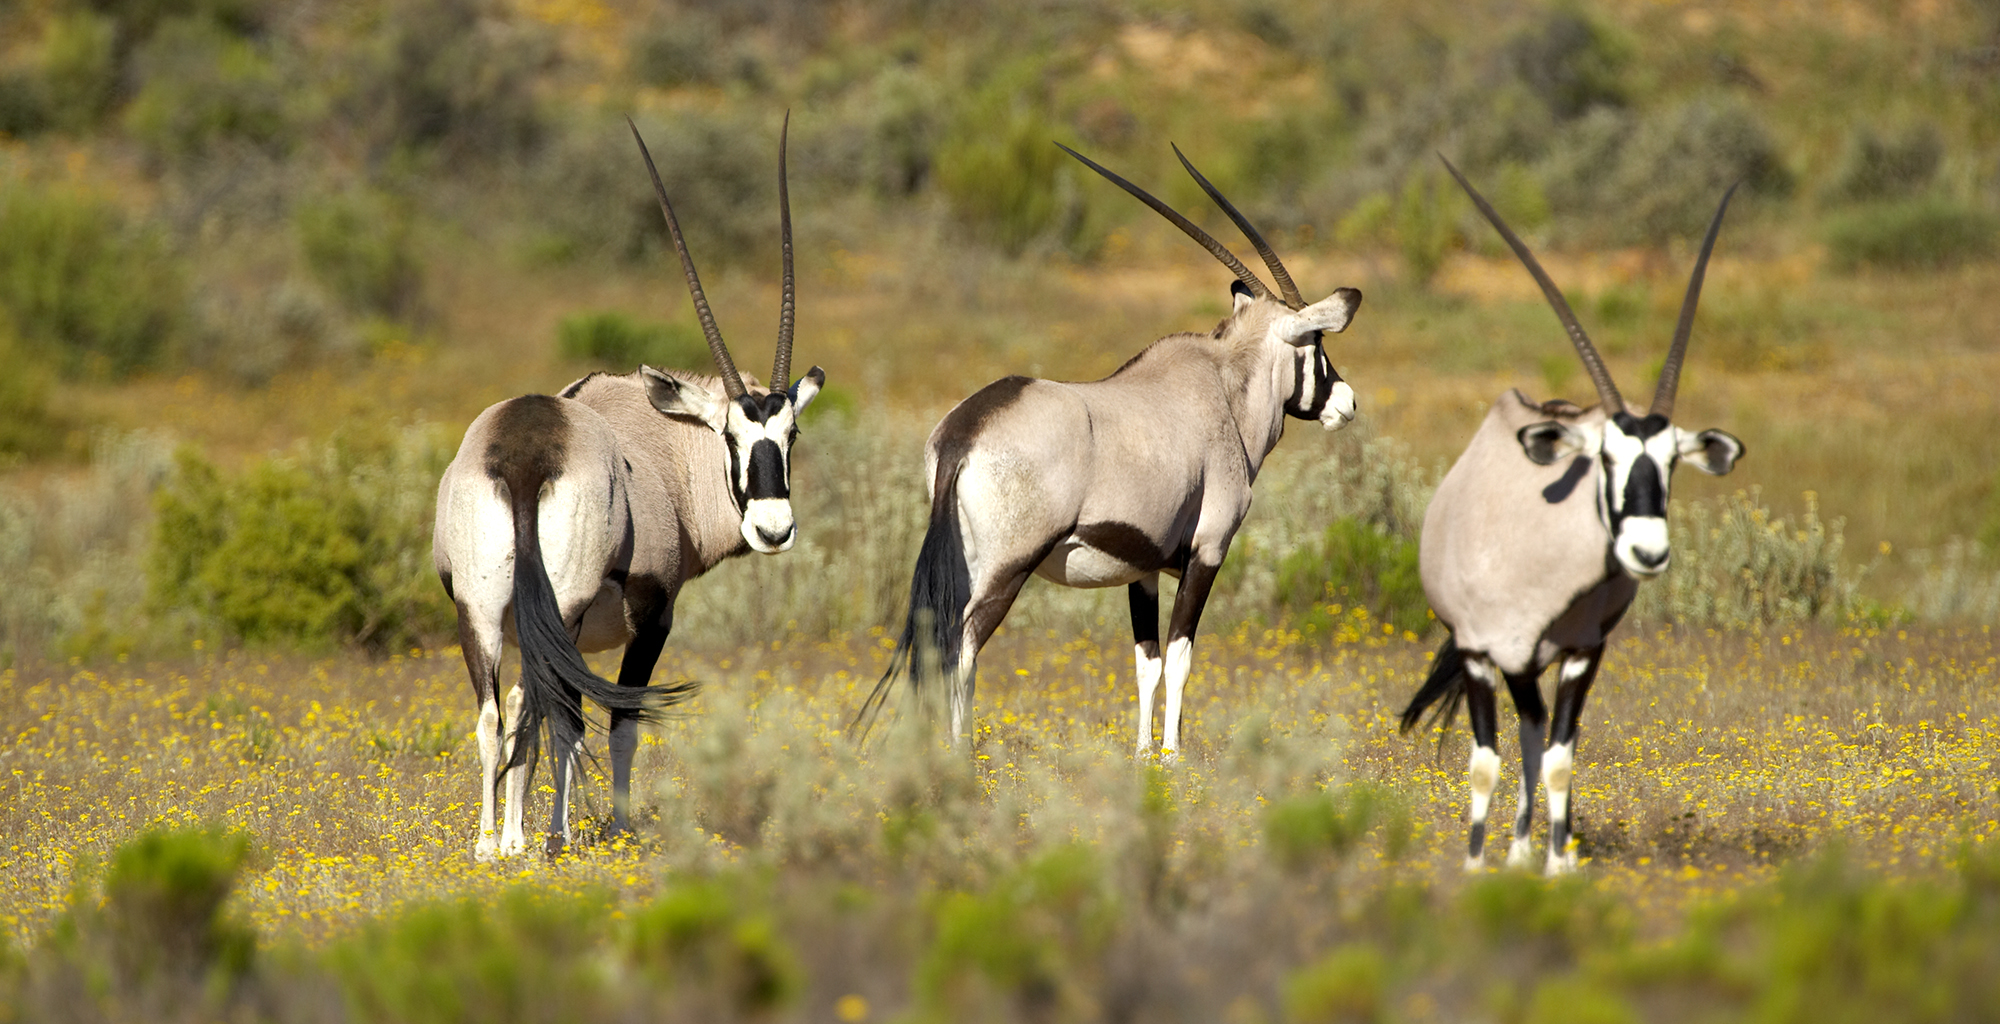 South-Africa-Bushmans-Kloof-Wildlife